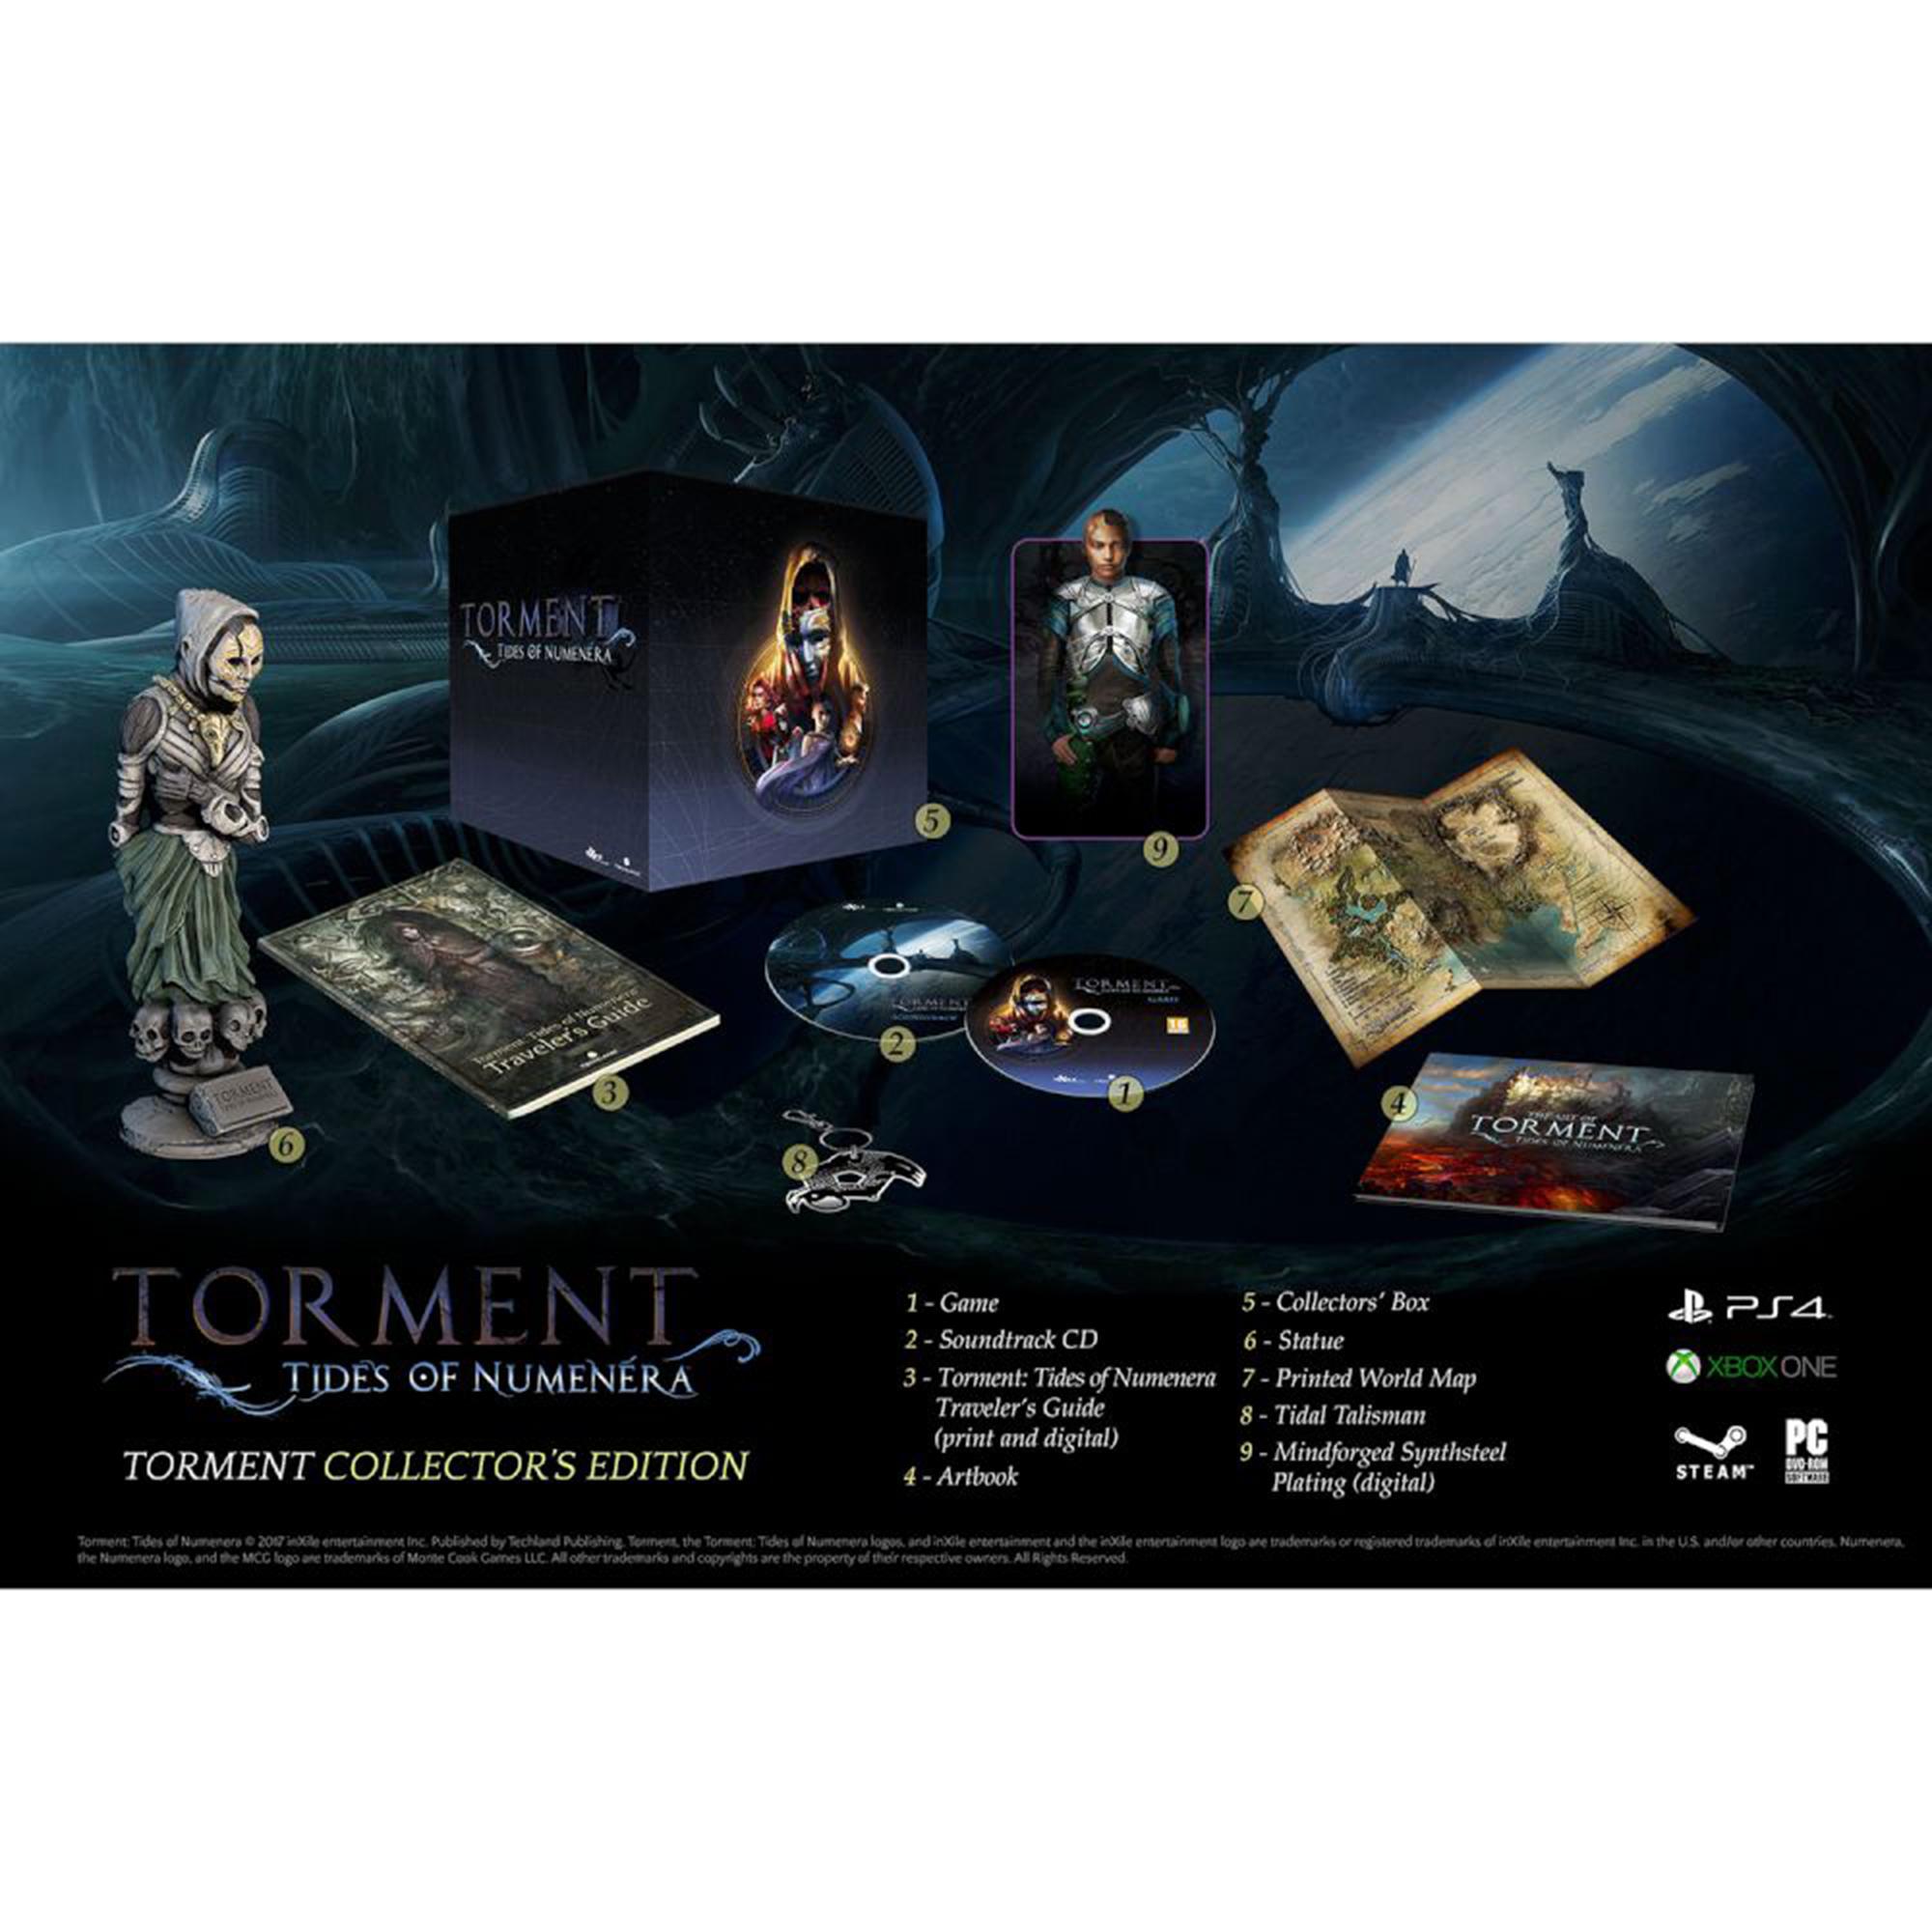 Joc Torment Tides Of Numenera Collector's Edition pentru Xbox One 14